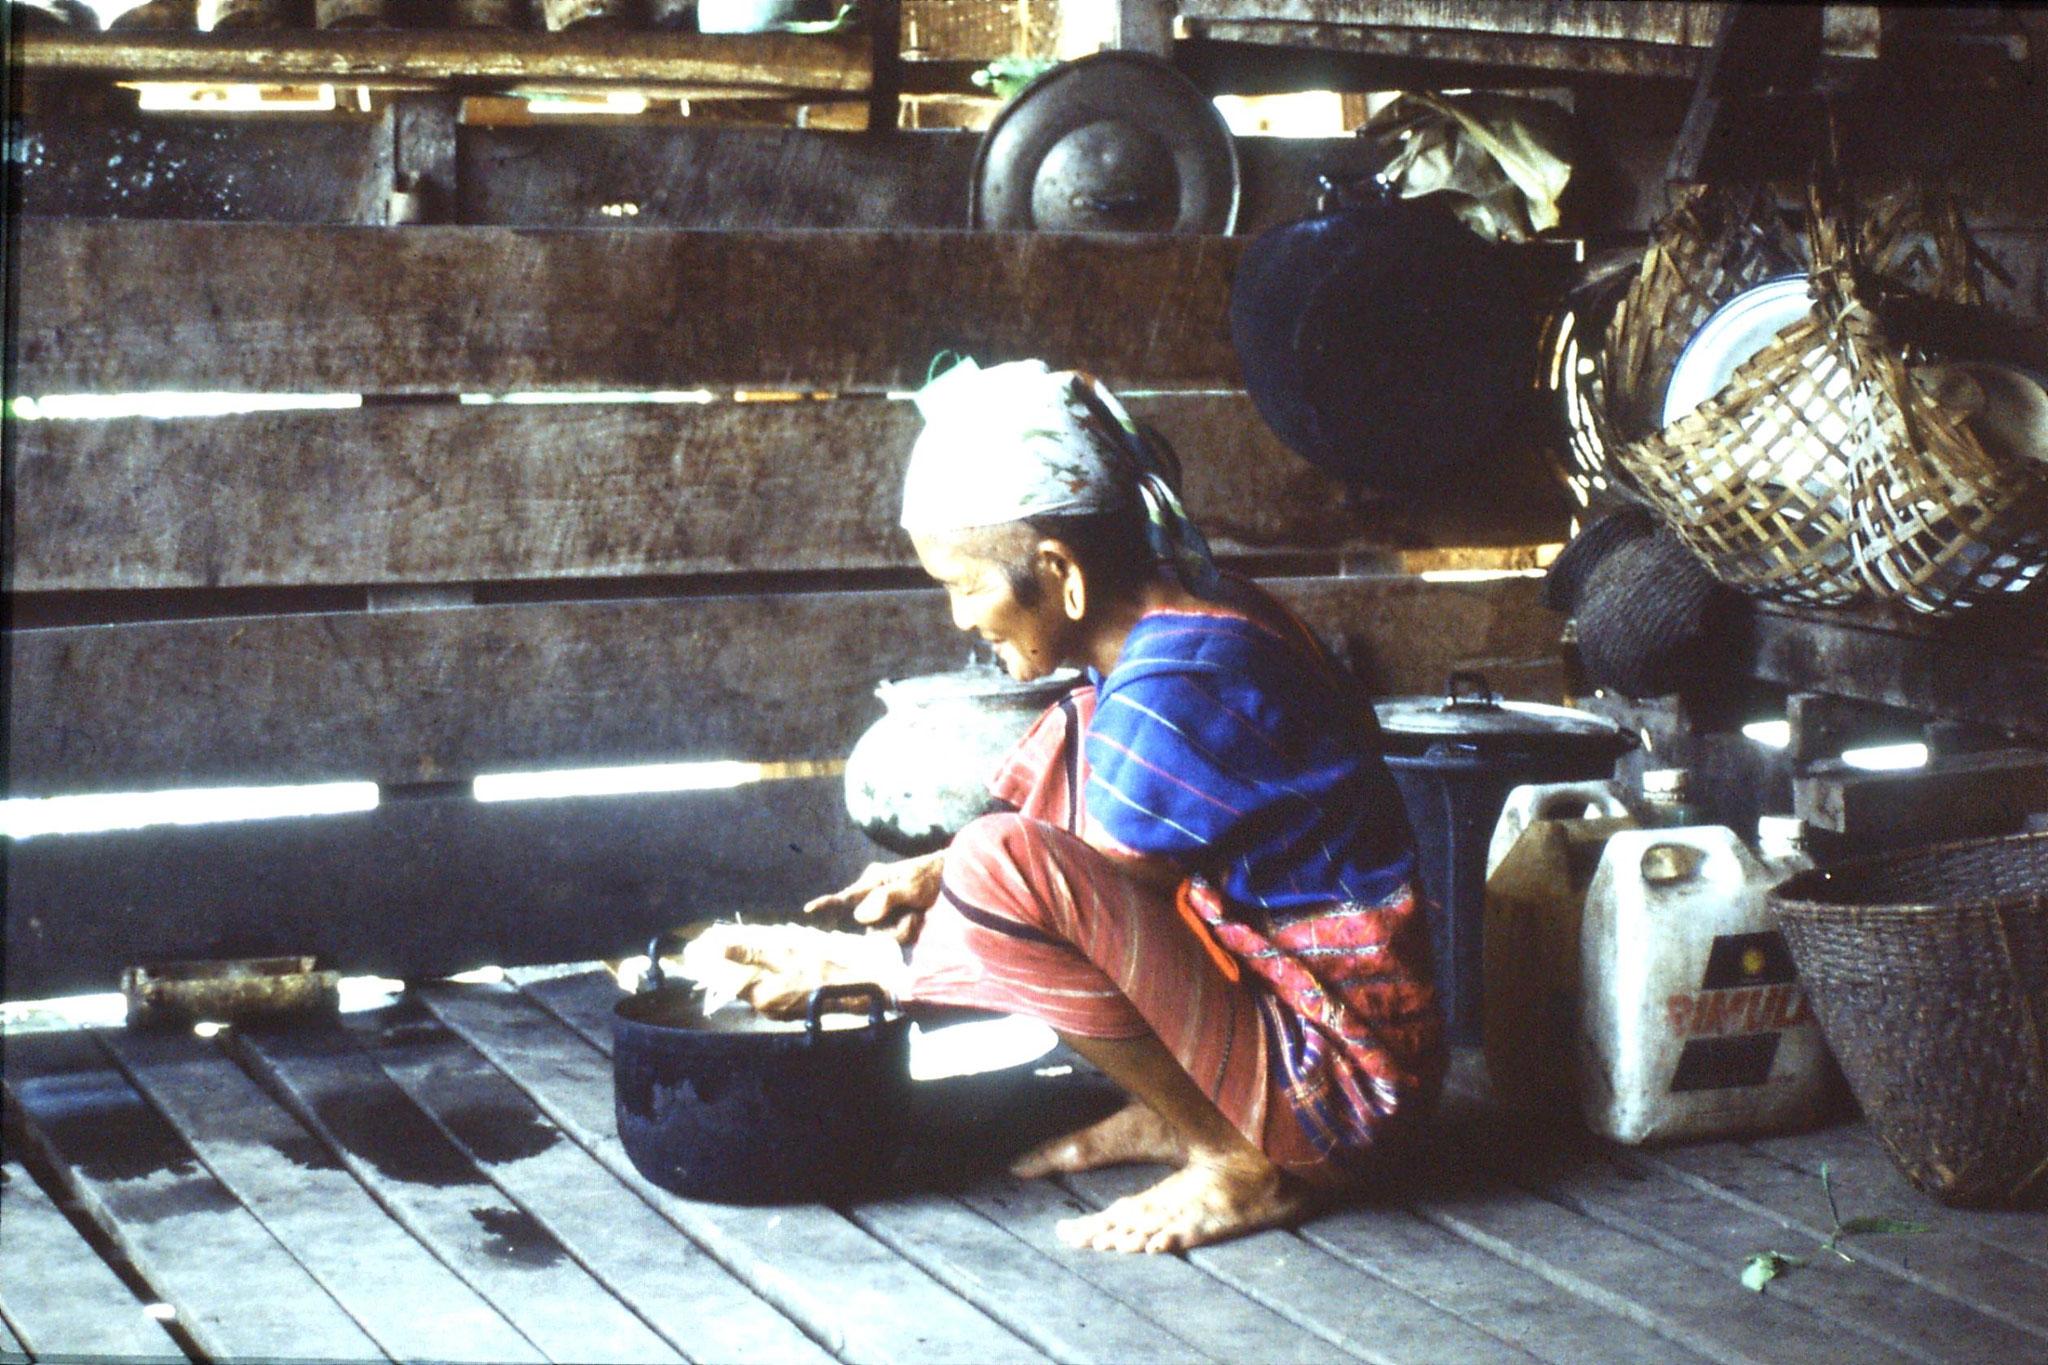 12/6/1990: 22: Trek - Hue Kom Karen village, chopping bamboo shoots